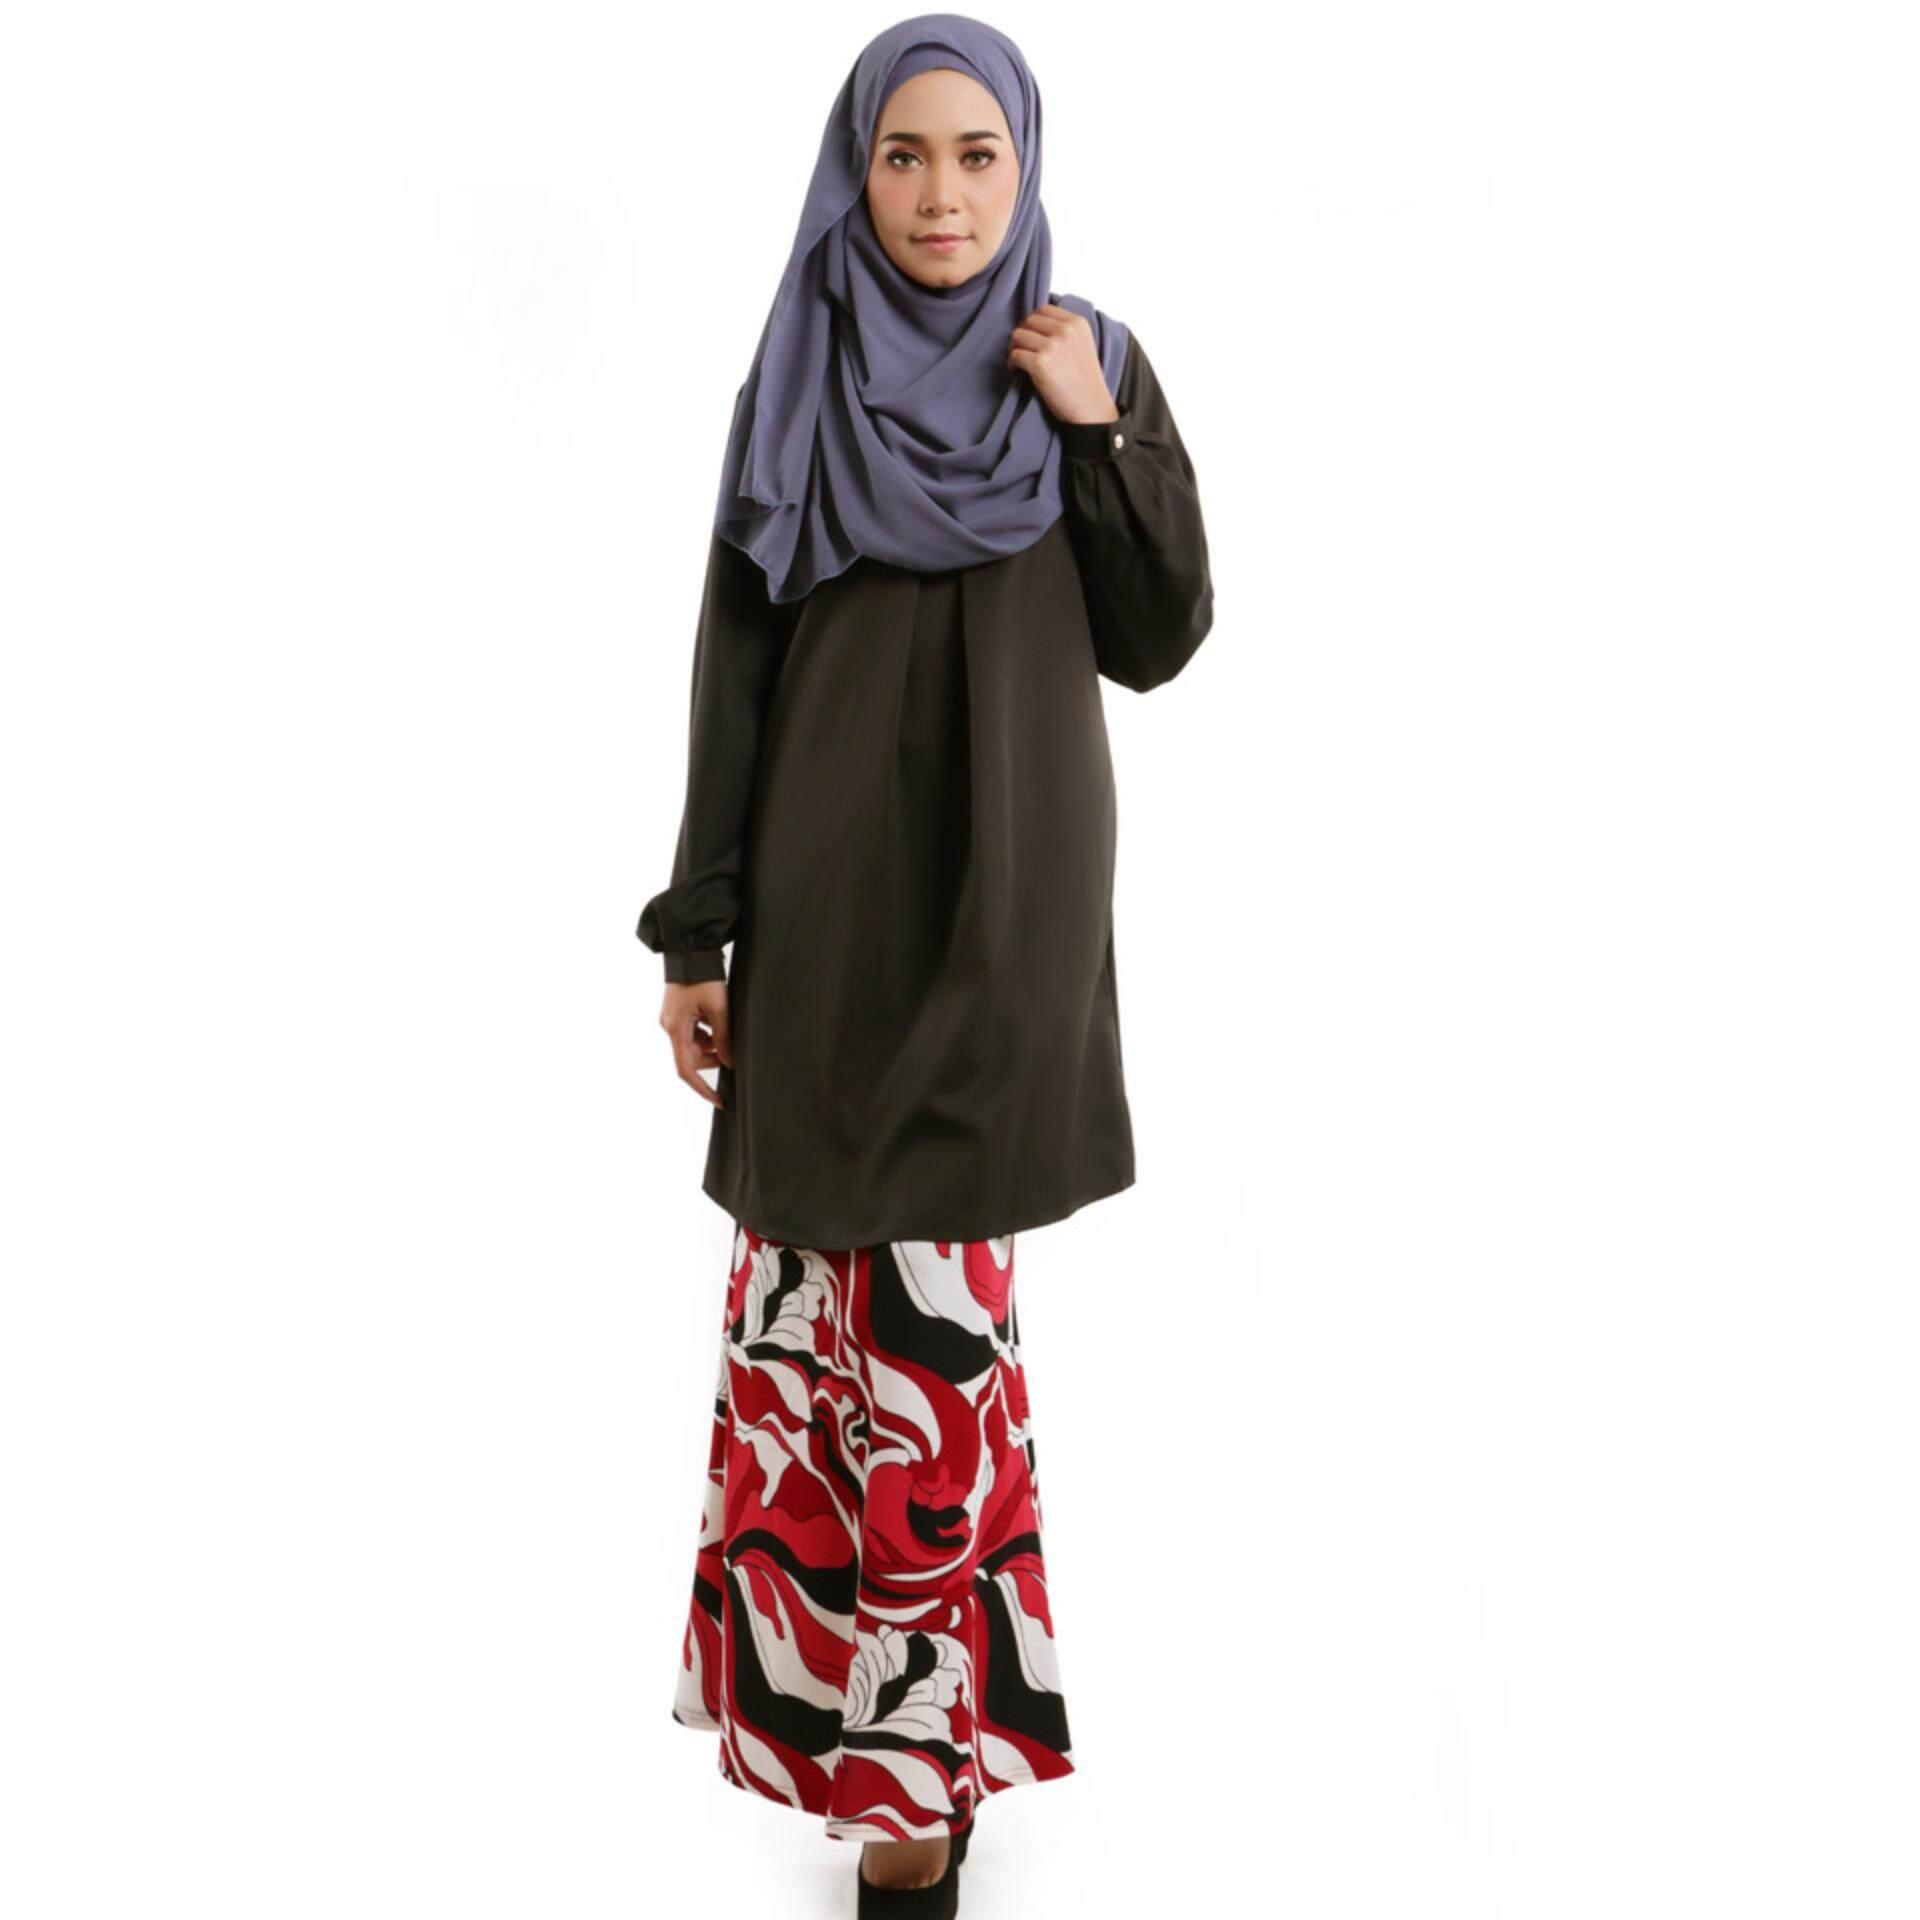 JF Fashion Fenna Kurung Set Blouse and Skirt M397 (Black)